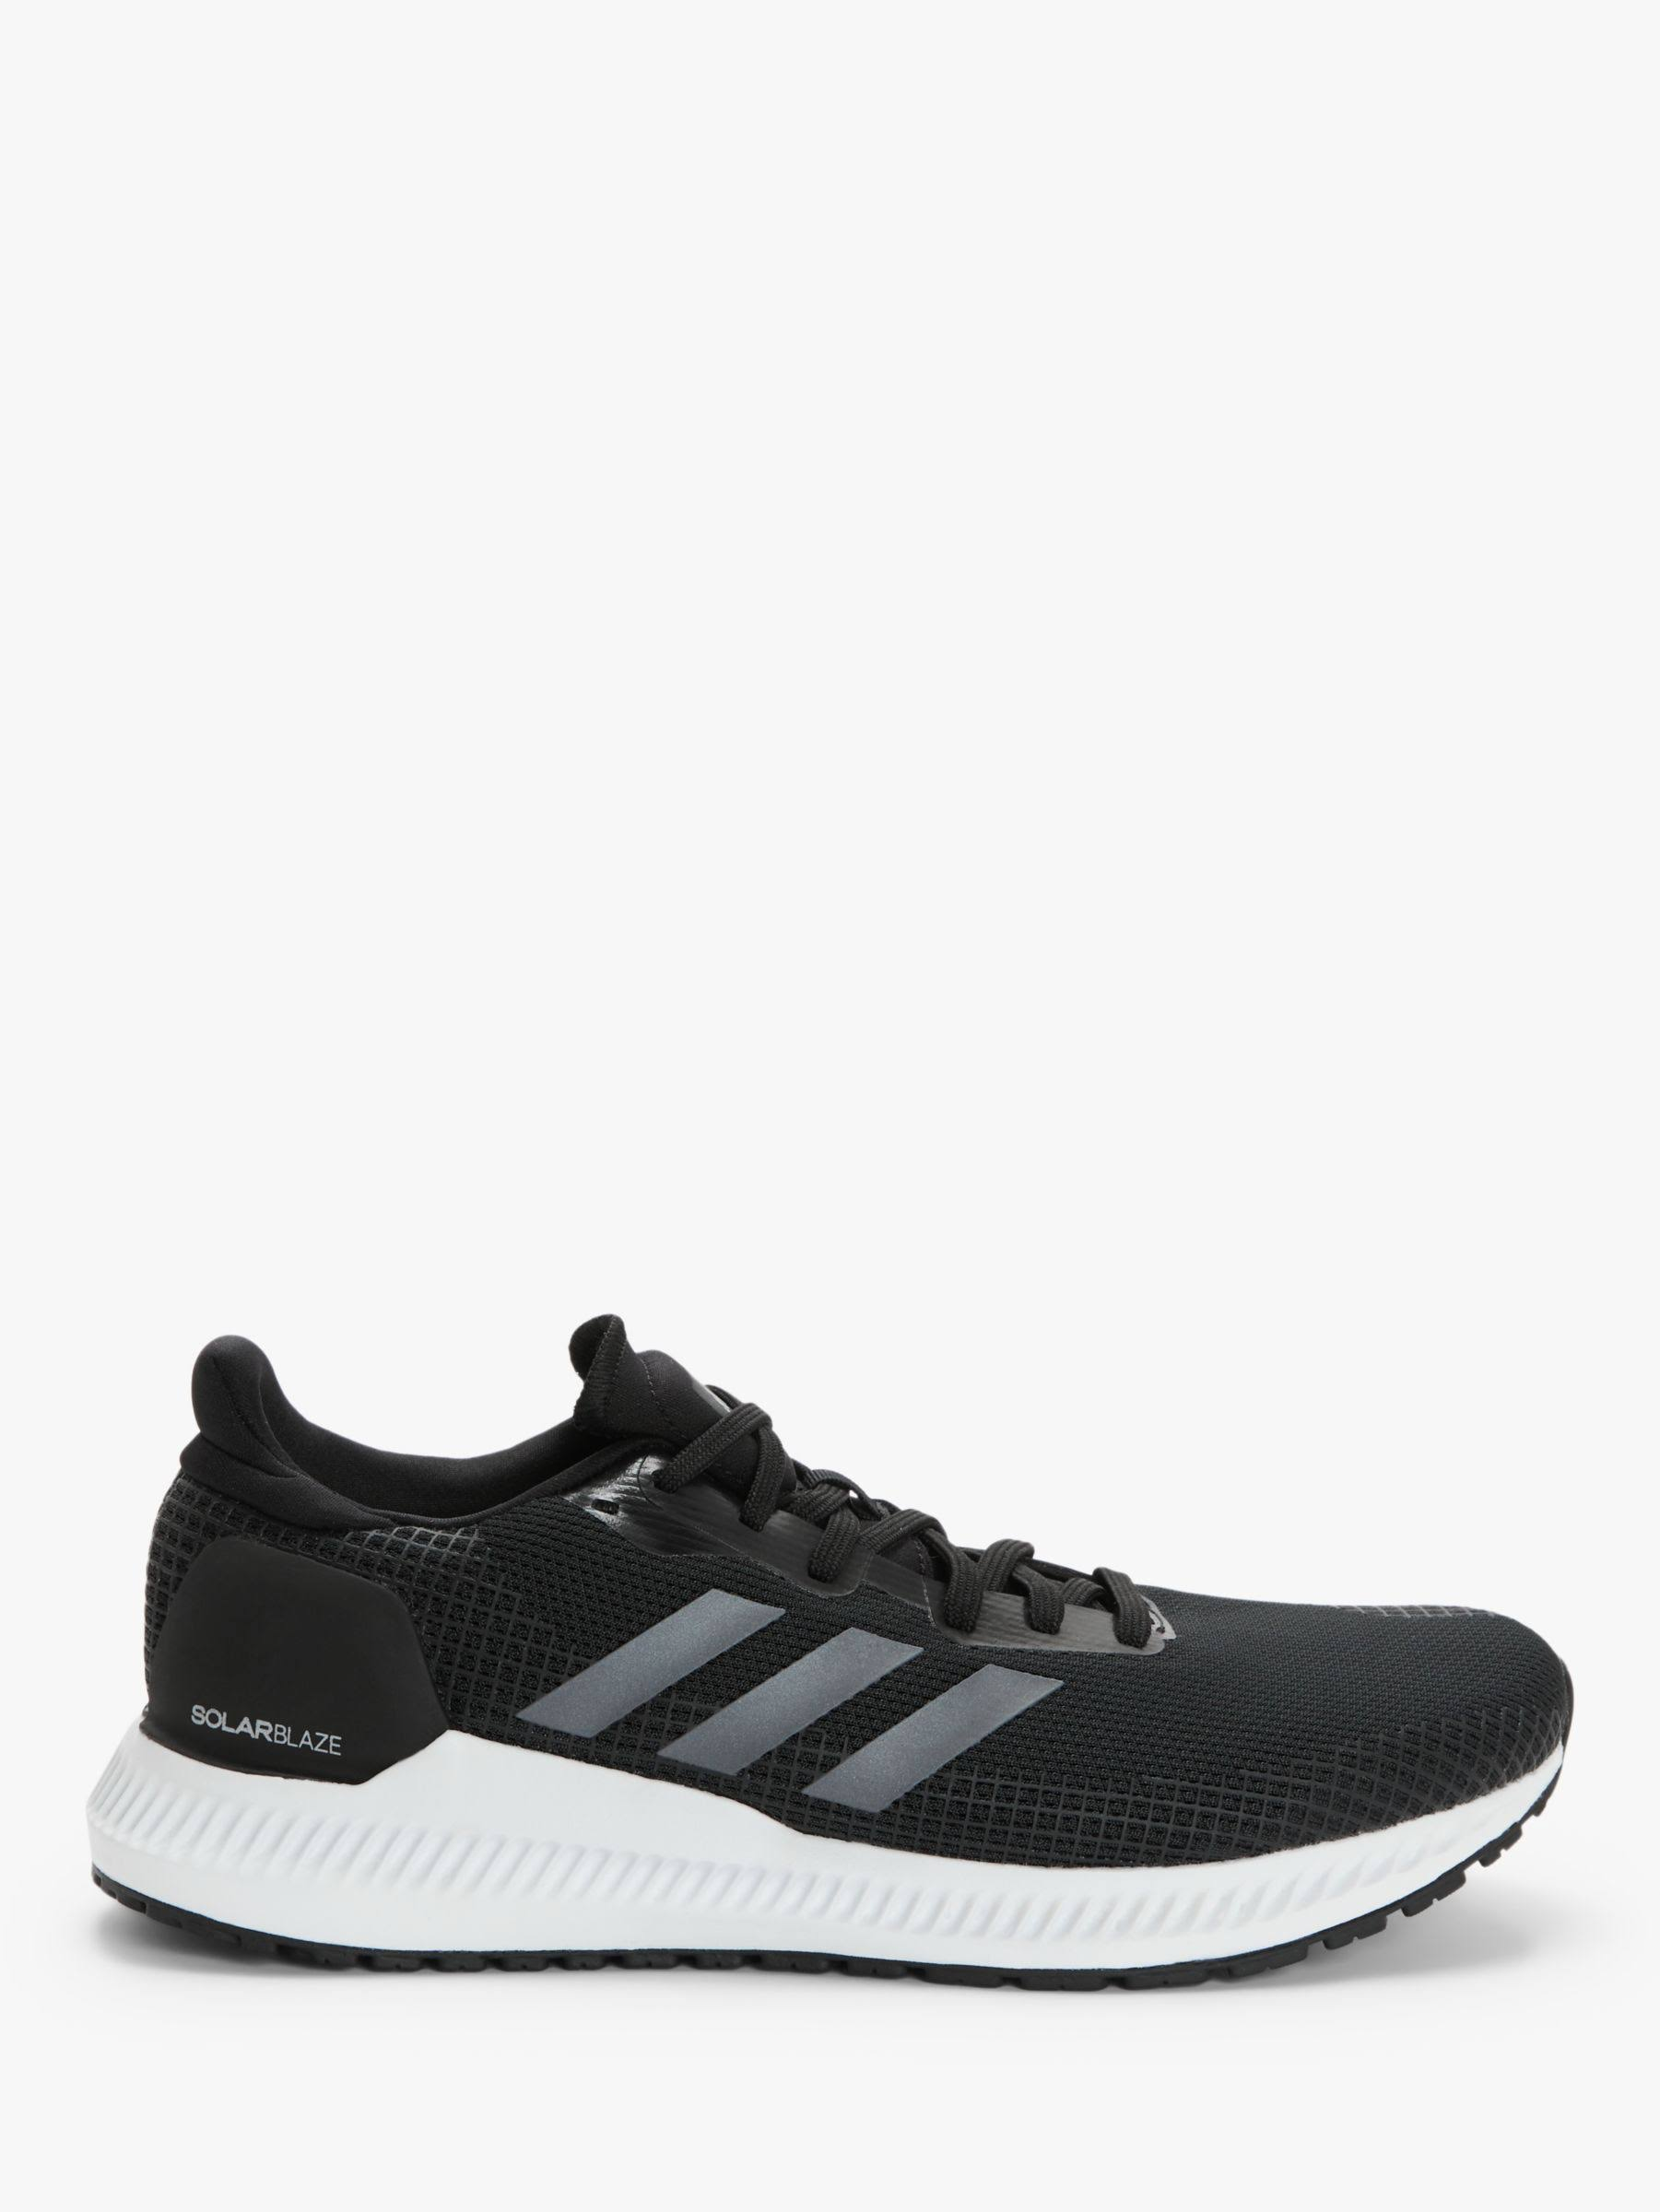 Adidas Solar Blaze Shoes Running - Black - Men